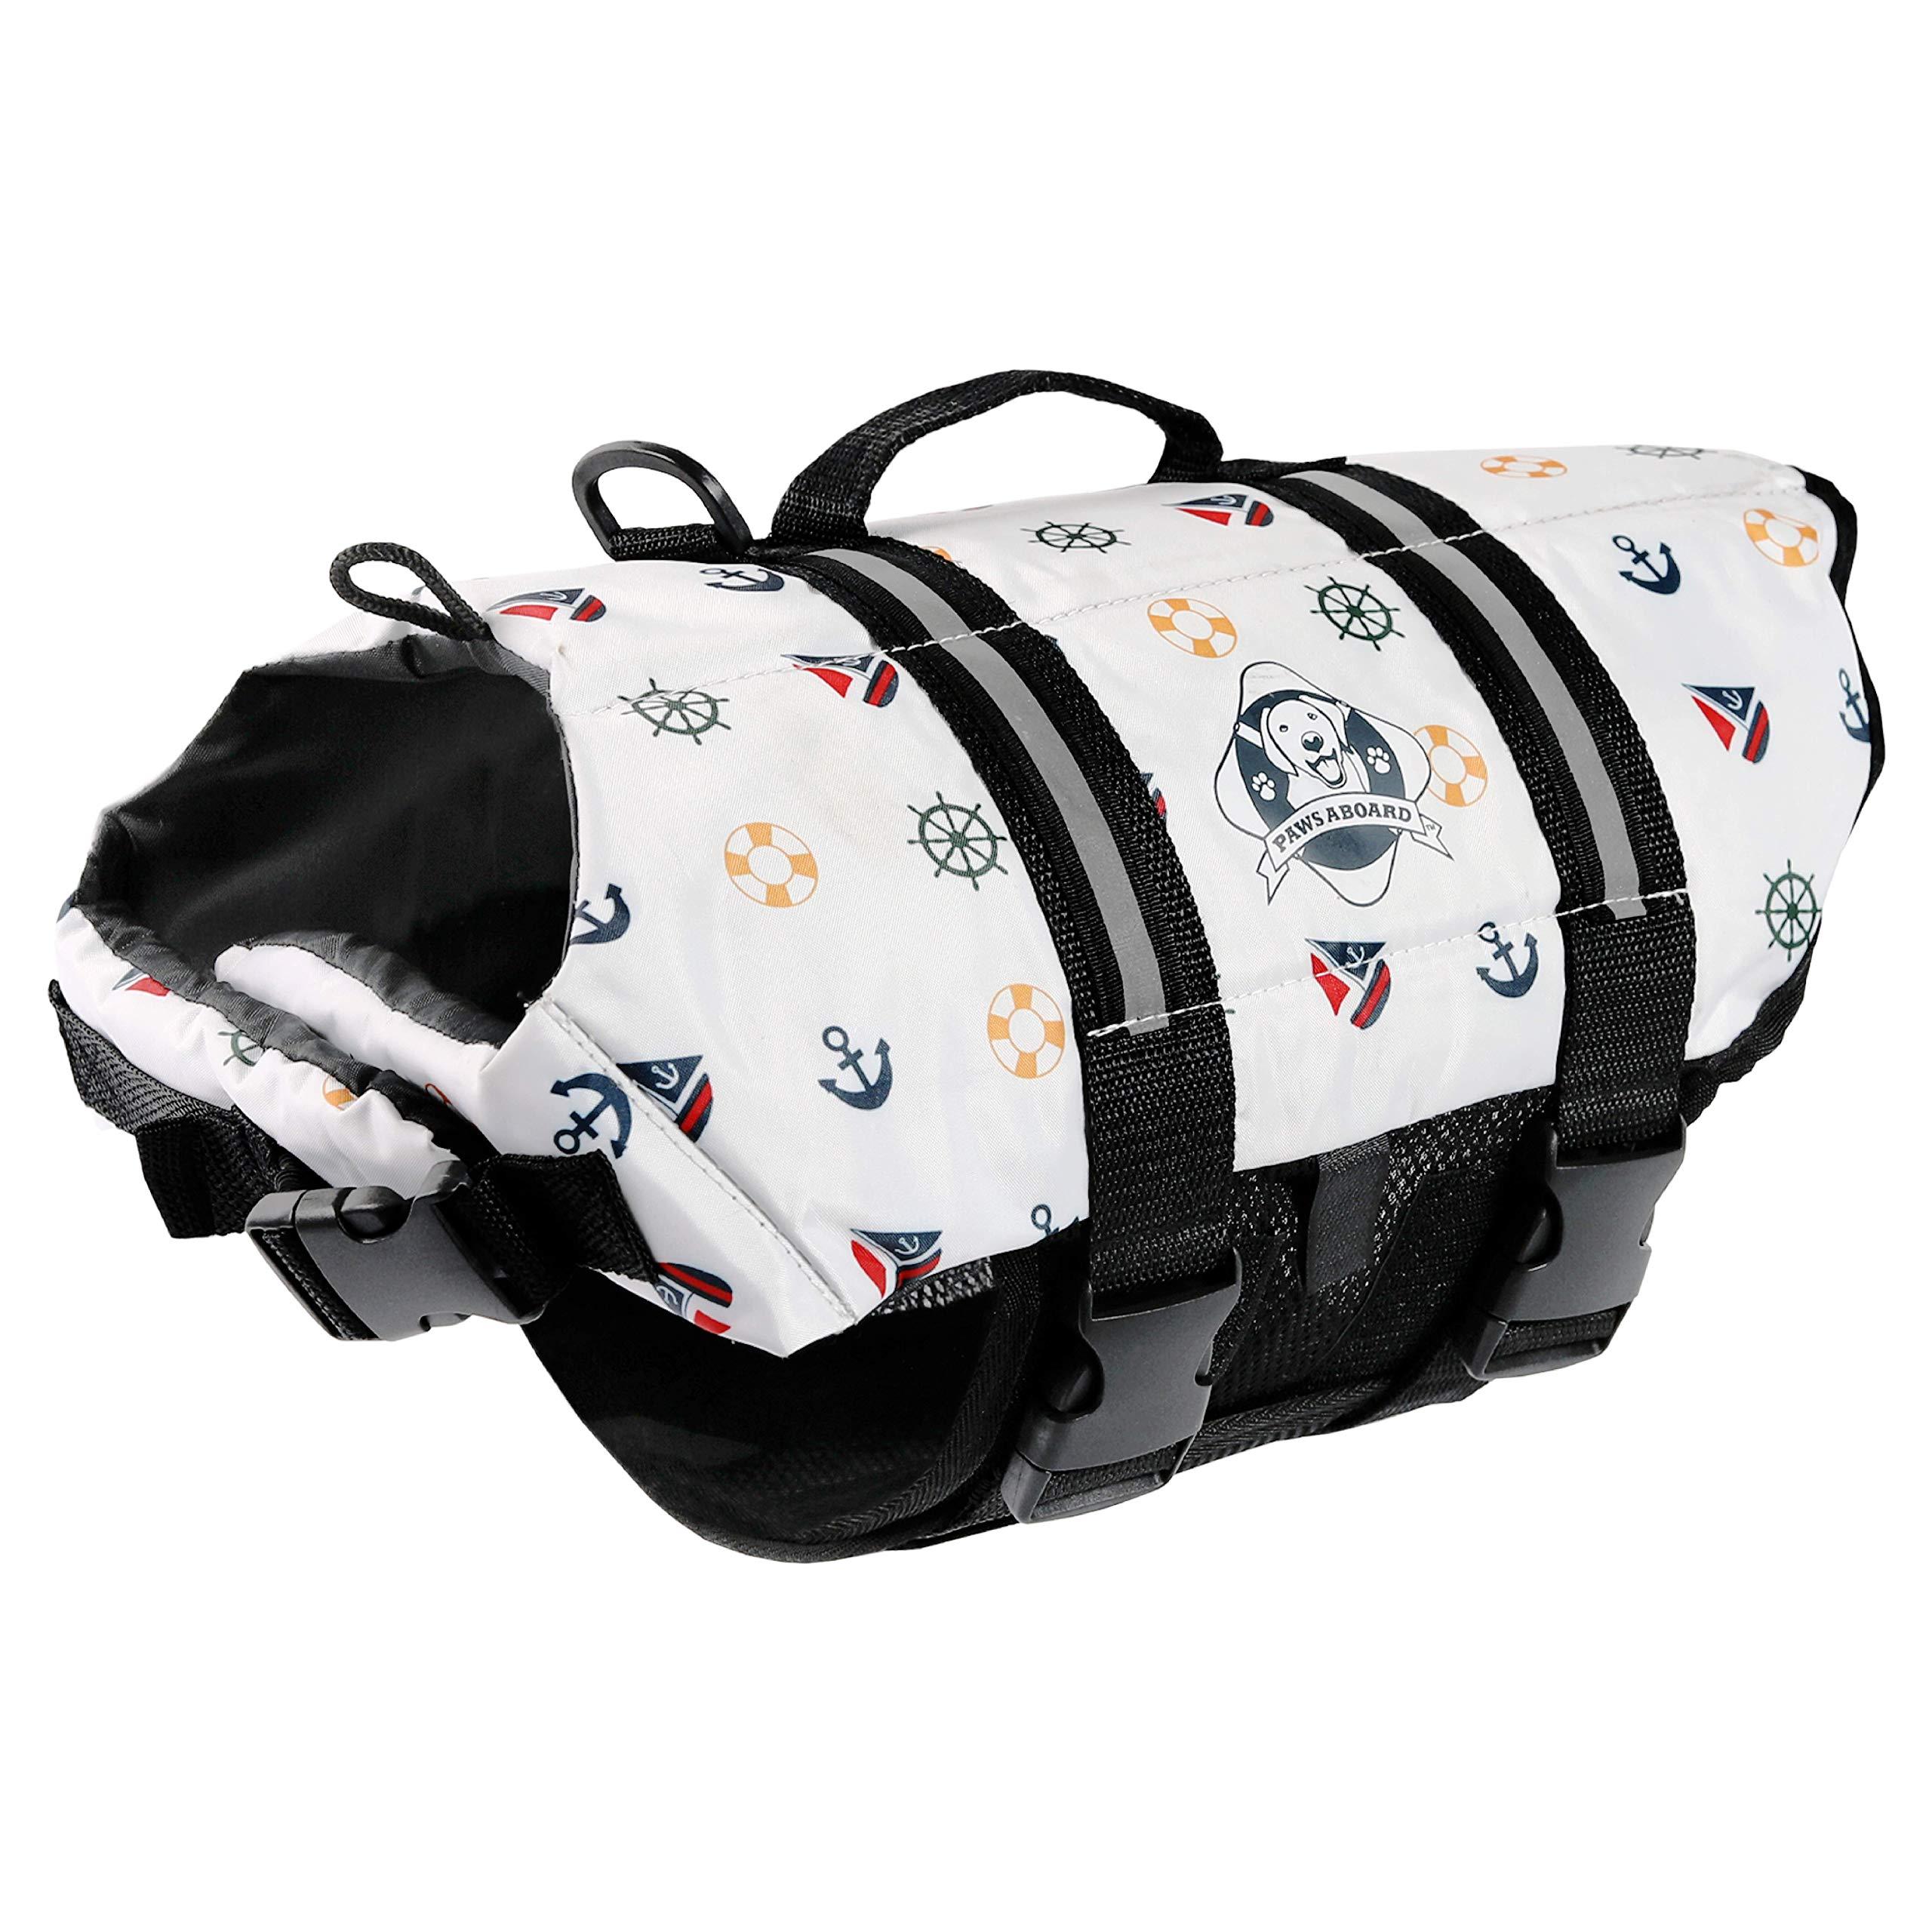 Paws Aboard XXS Designer Doggy Life Jacket, Nautical print